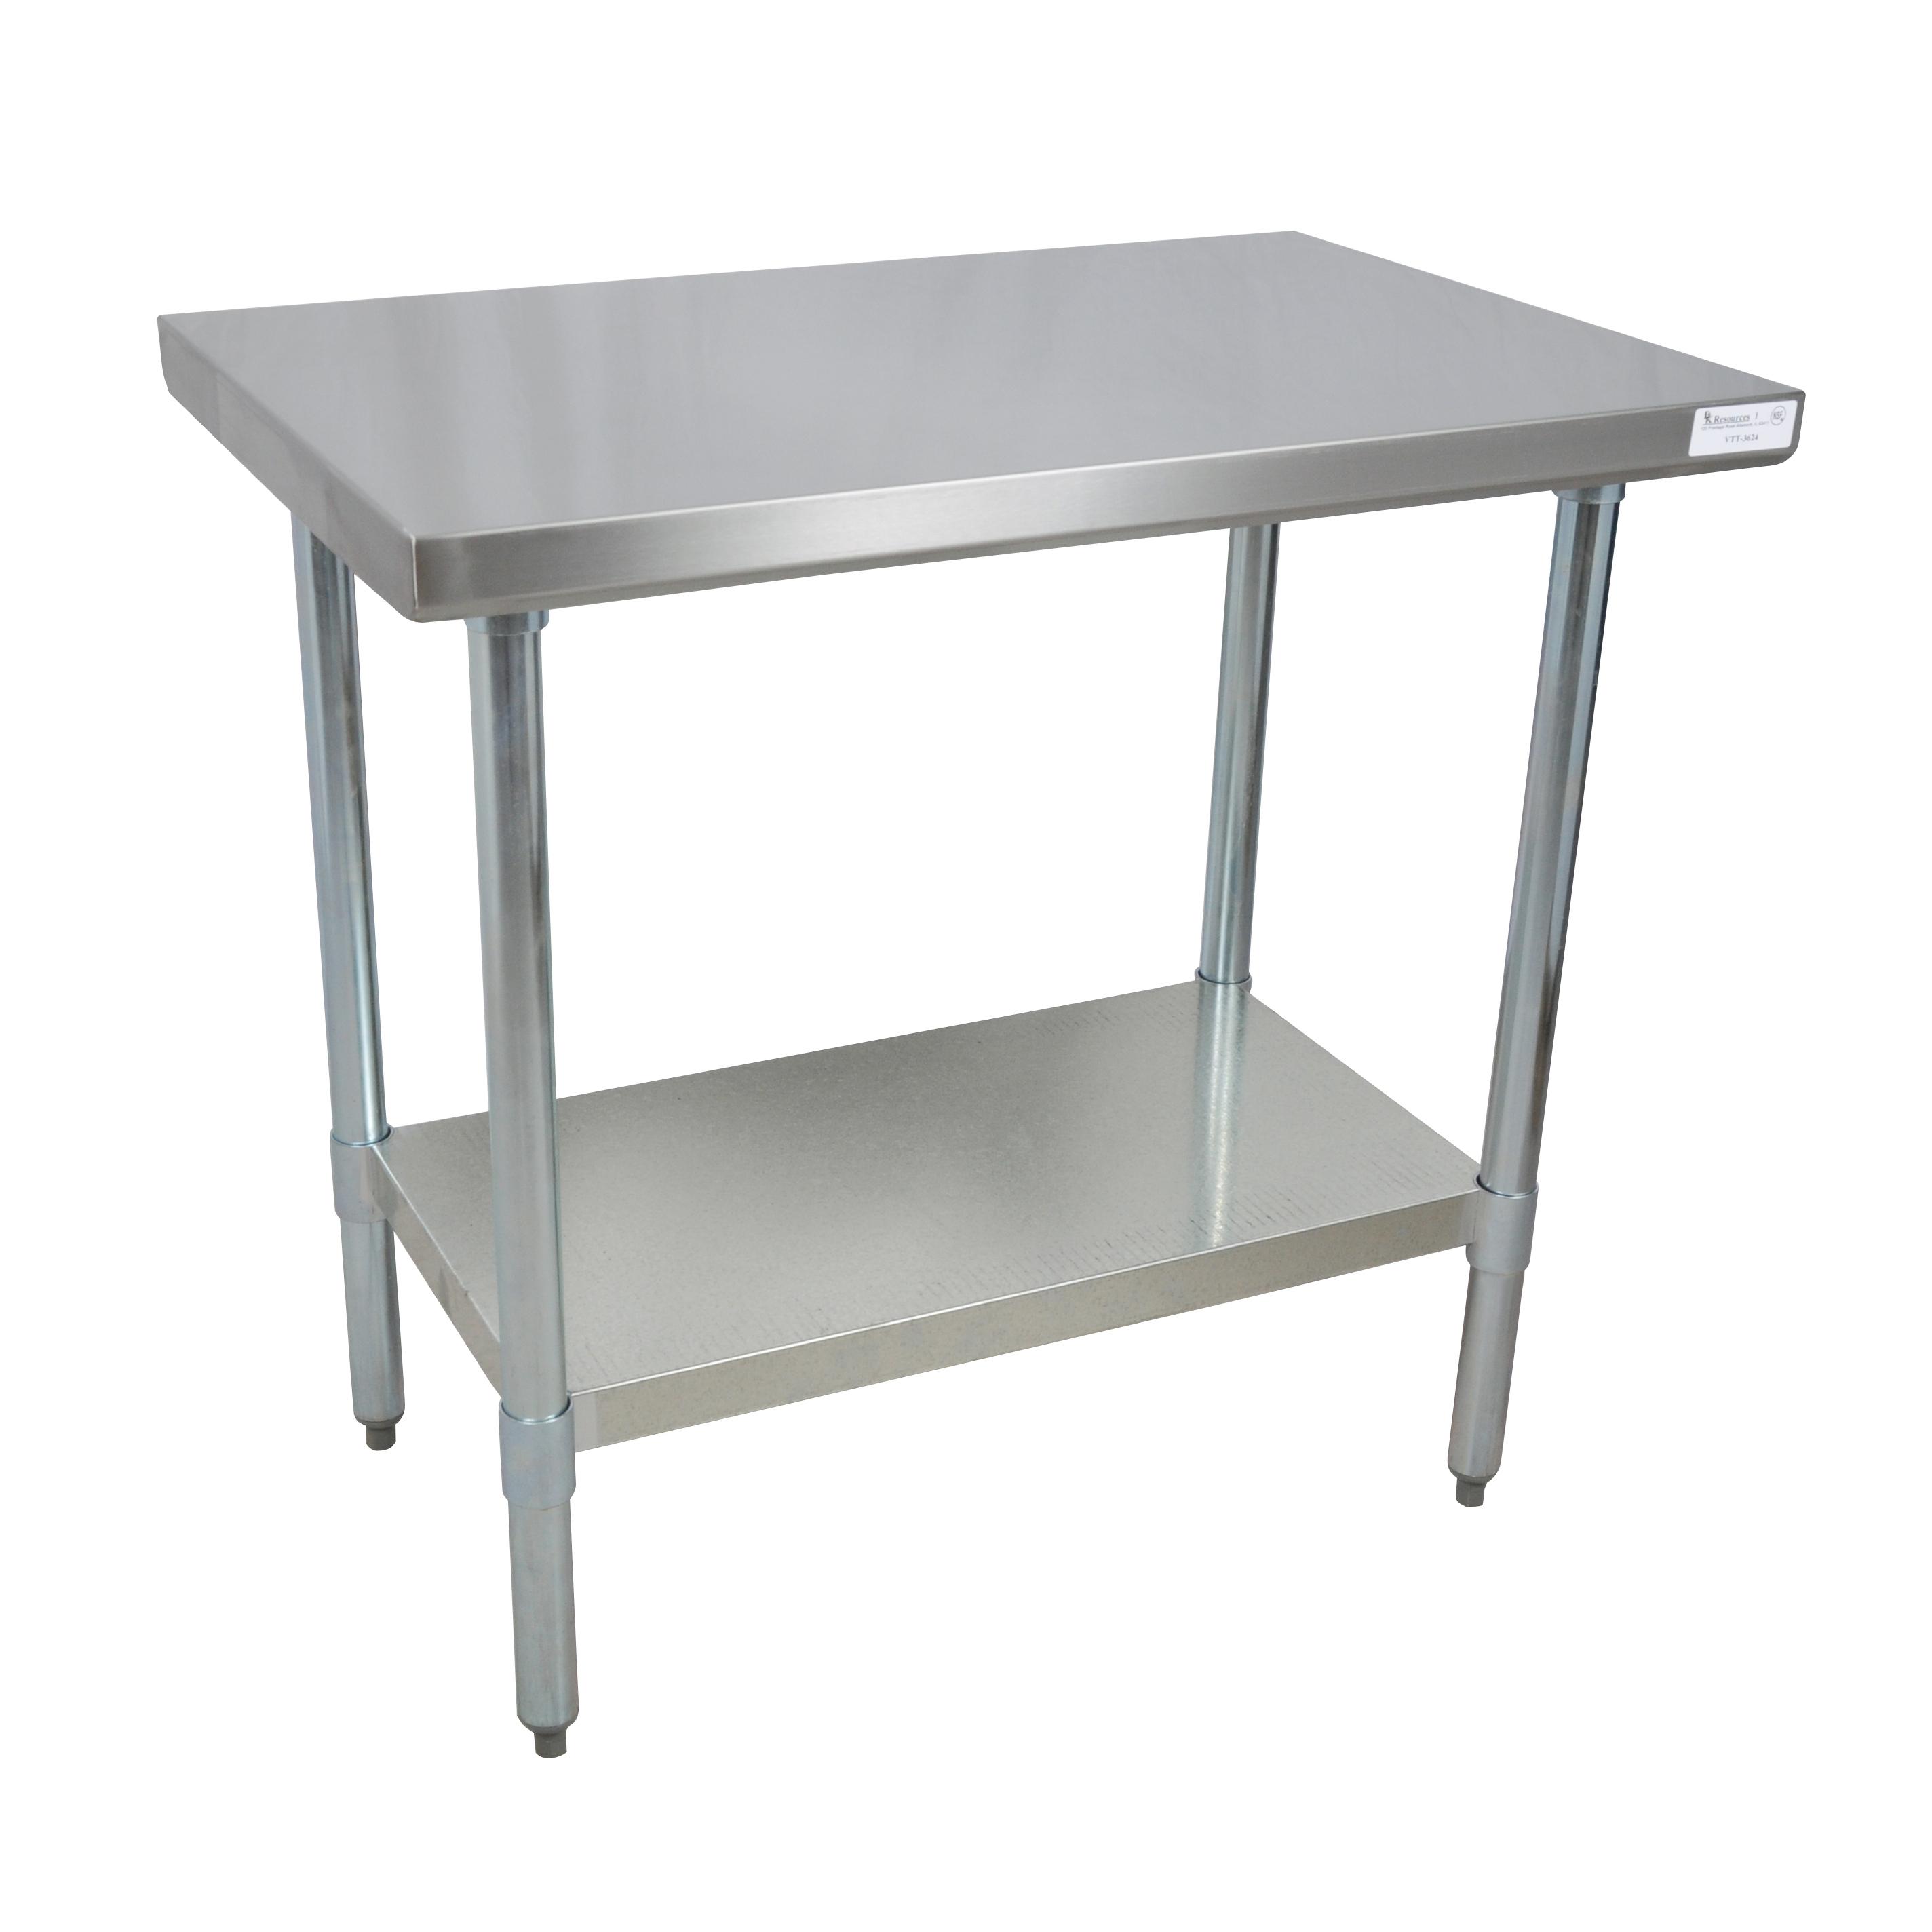 BK Resources CTT-3630 work table,  36